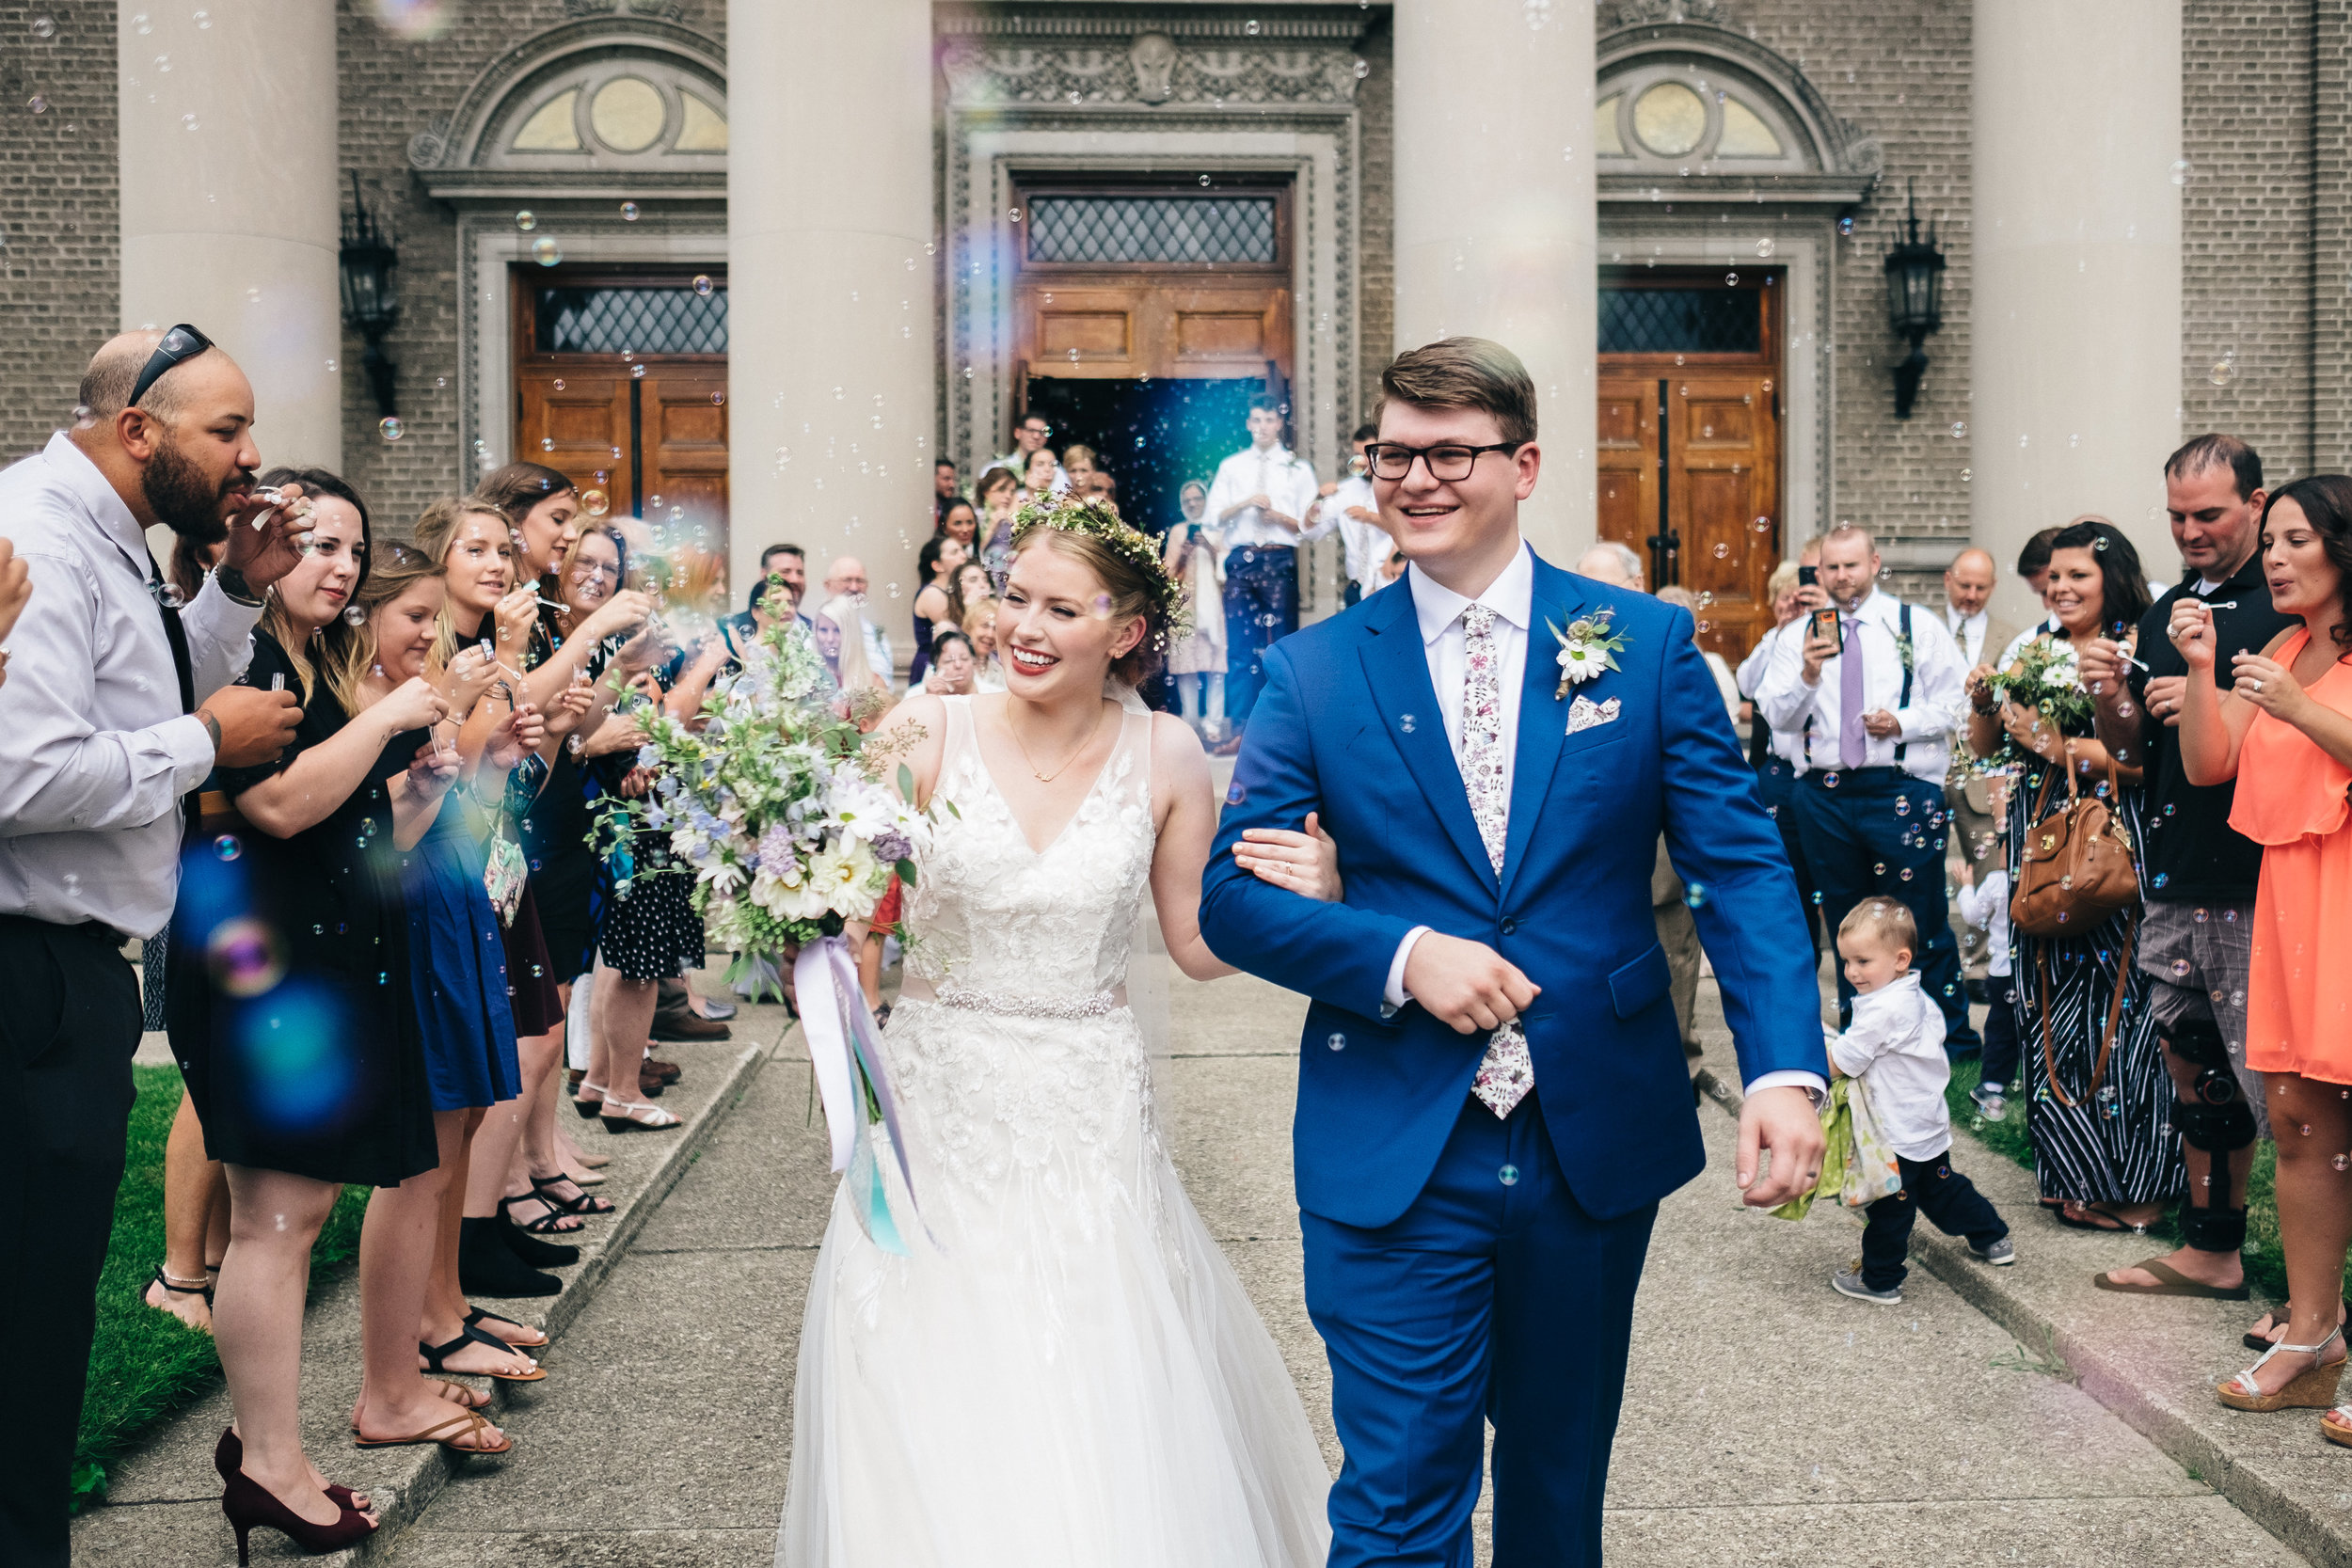 Bubble exit at wedding ceremony in downtown Toledo, Ohio.